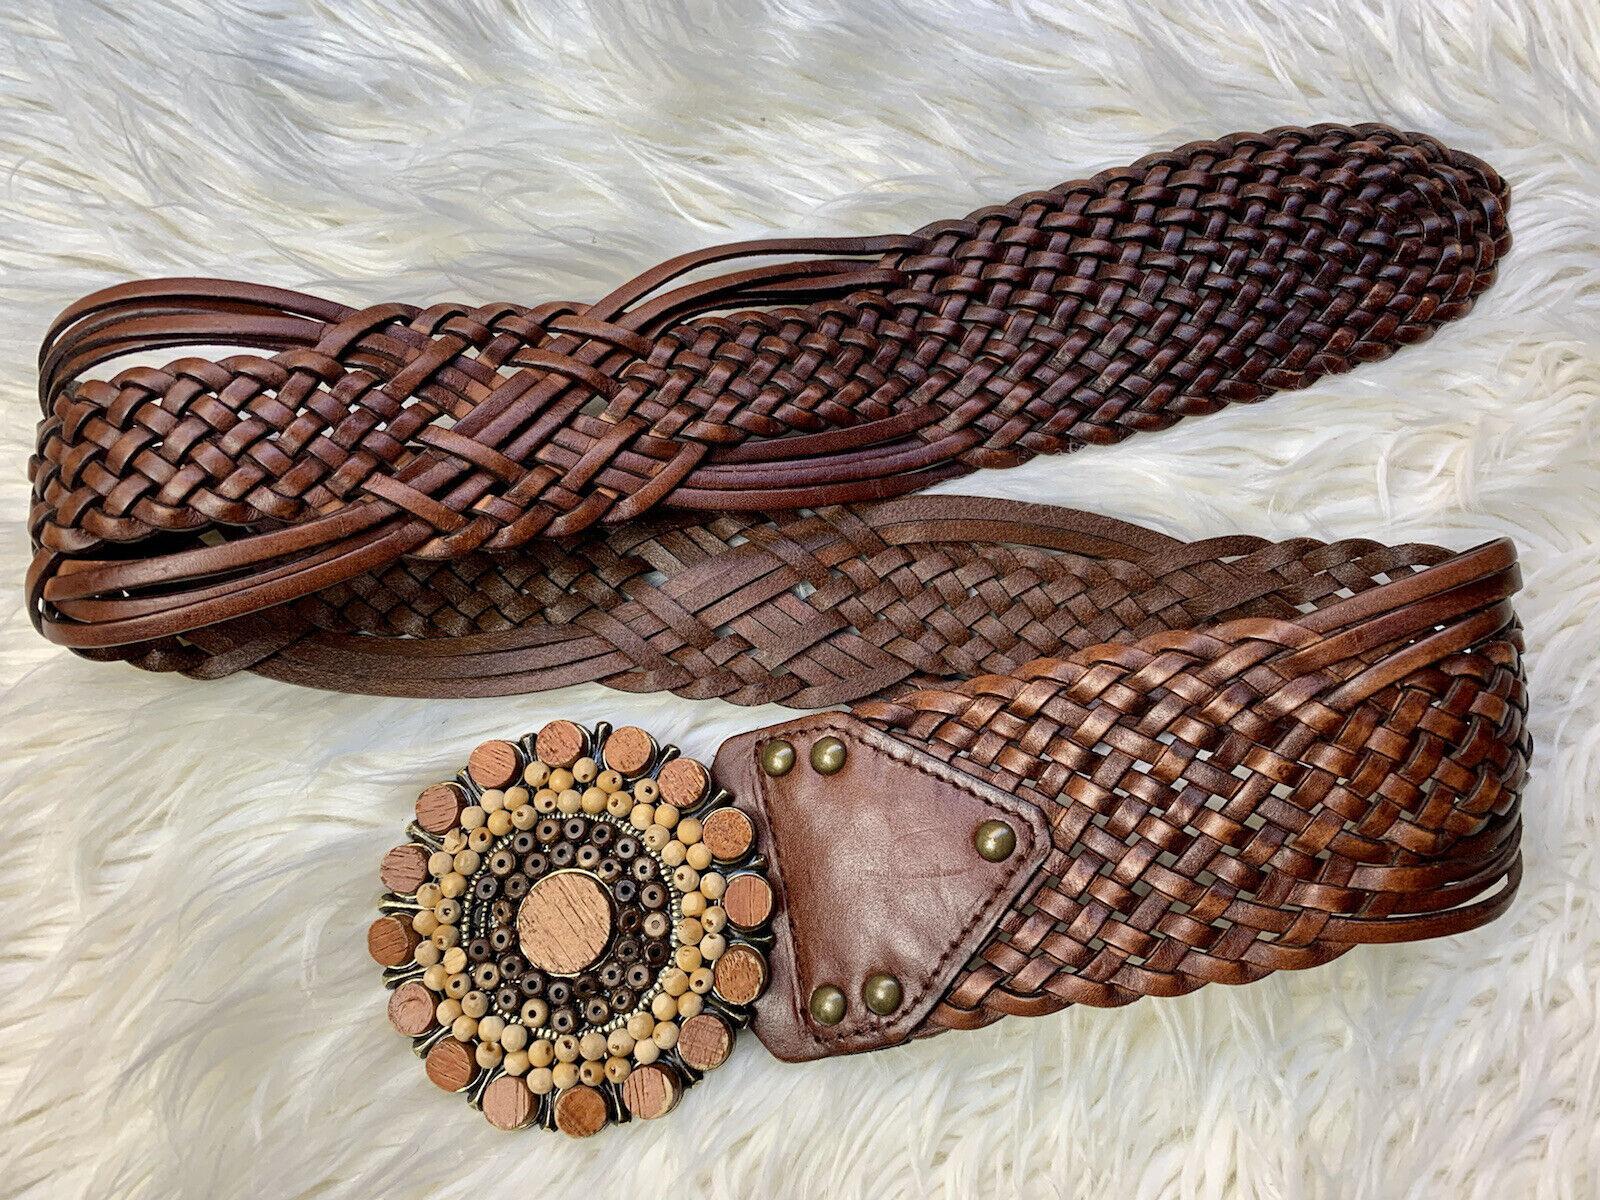 Wide Boho Brown Leather Belt Braided Wood Beads Buckle Gypsy Hippie Festival S